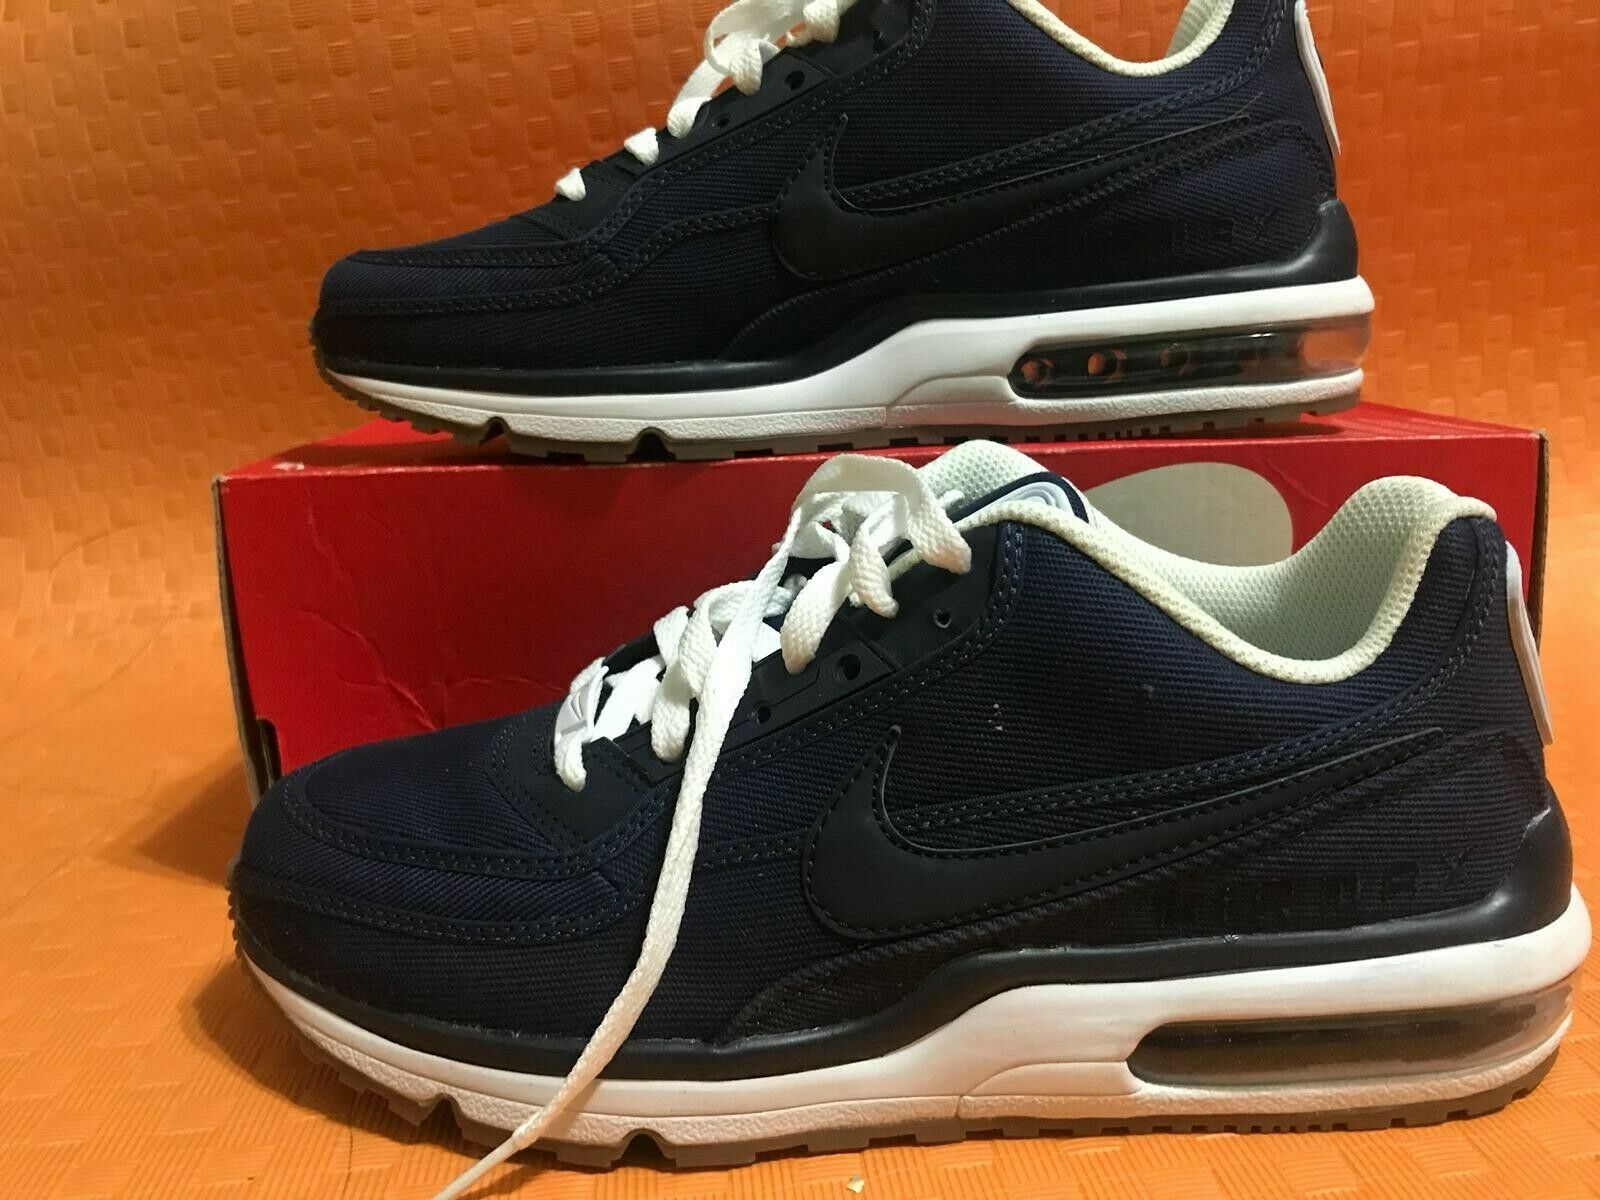 new concept 24776 e480b Nike Air 3 TXT Men s shoes Midnight Nvy Obsdn White Brw 746379-412 sz8 LTD  Max nrhjss7400-new shoes